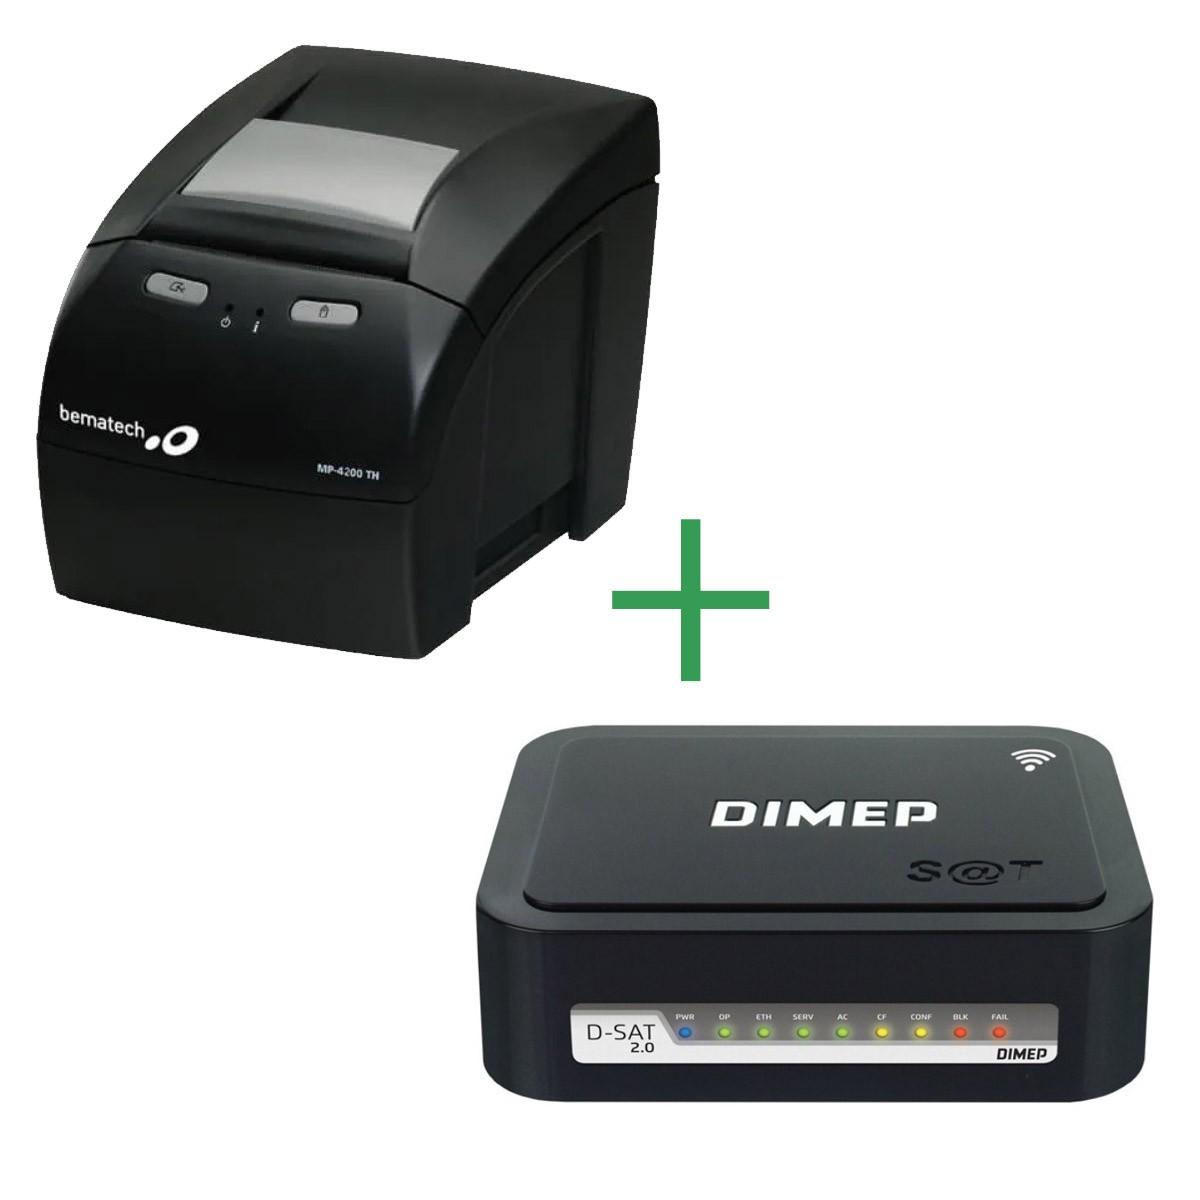 Combo SAT Fiscal D-SAT 2.0 Dimep + Impressora MP-4200 TH Bematech